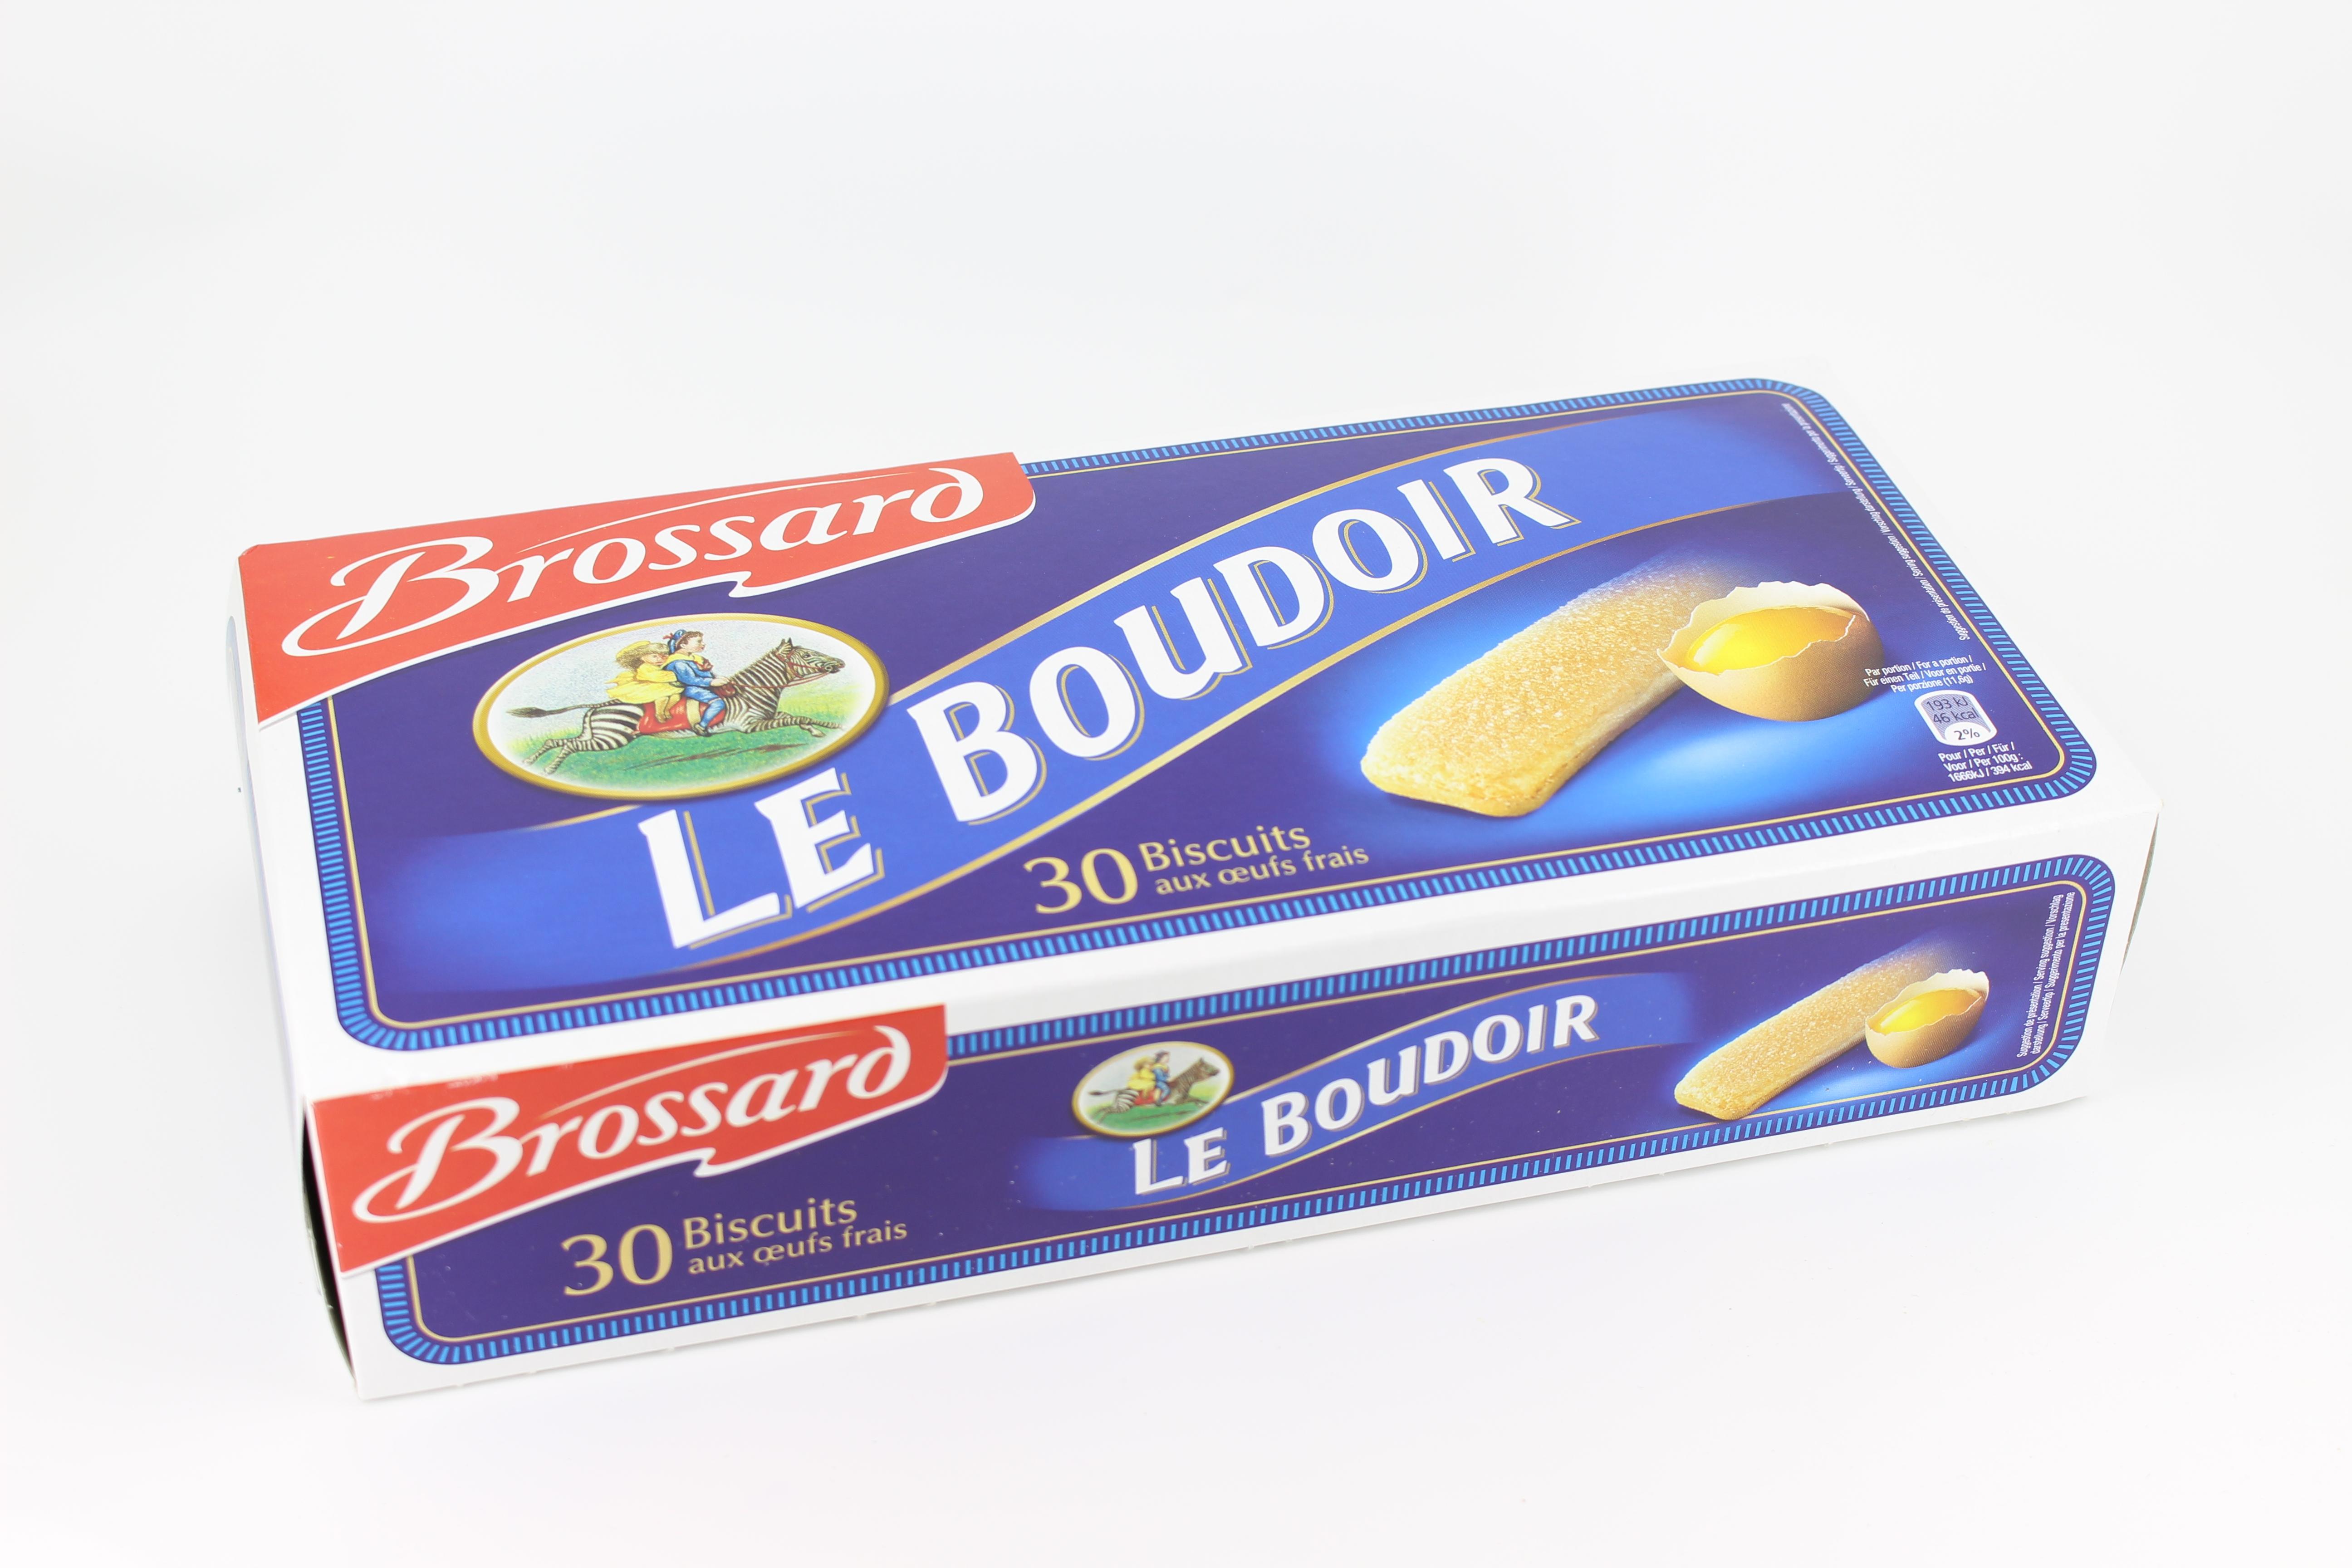 Boudoirs, Brossard (175 g)